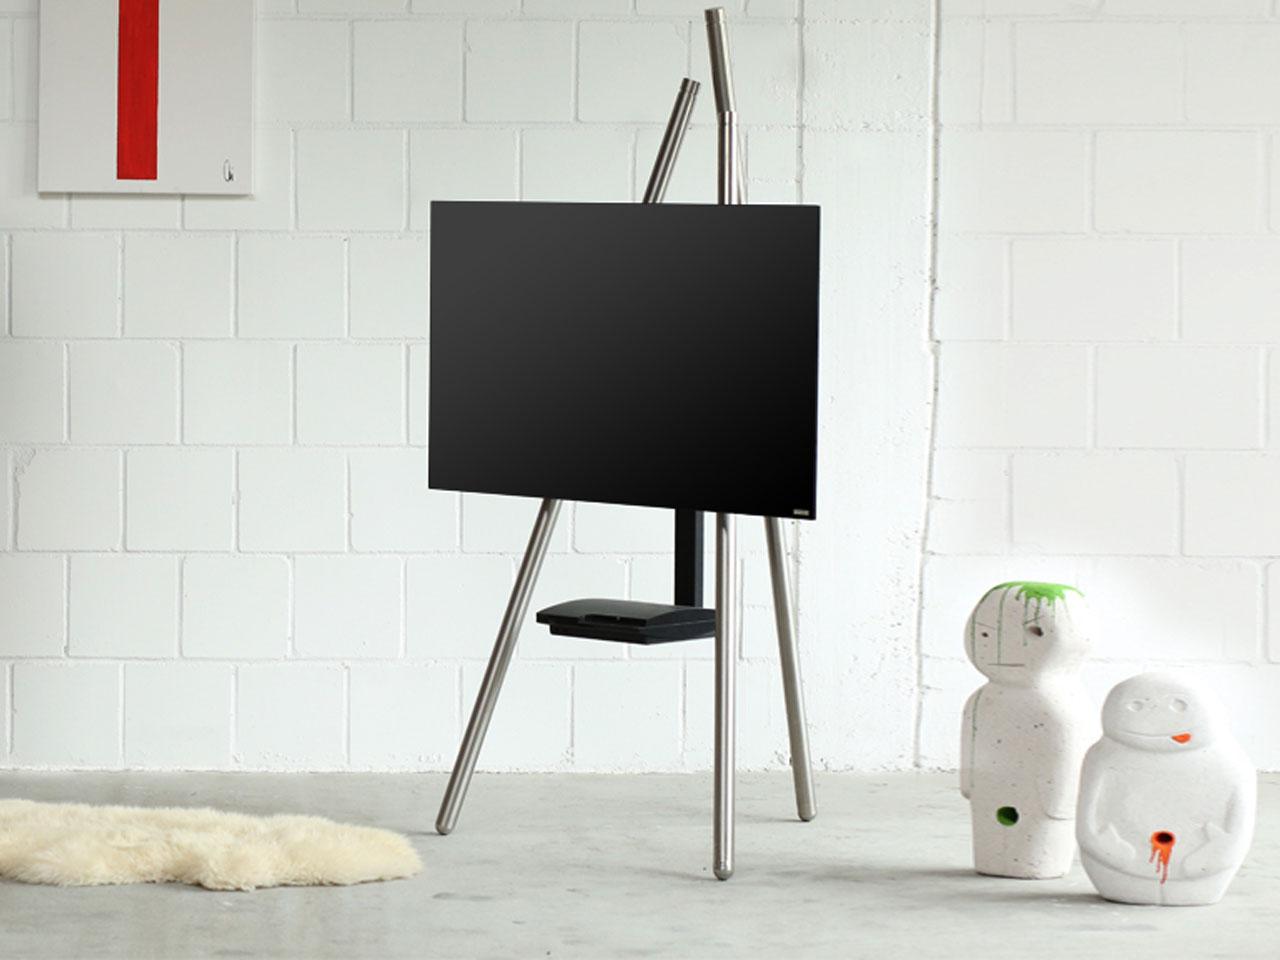 wissmann tv halter tripod art130 g nstig kaufen cmb systeme. Black Bedroom Furniture Sets. Home Design Ideas